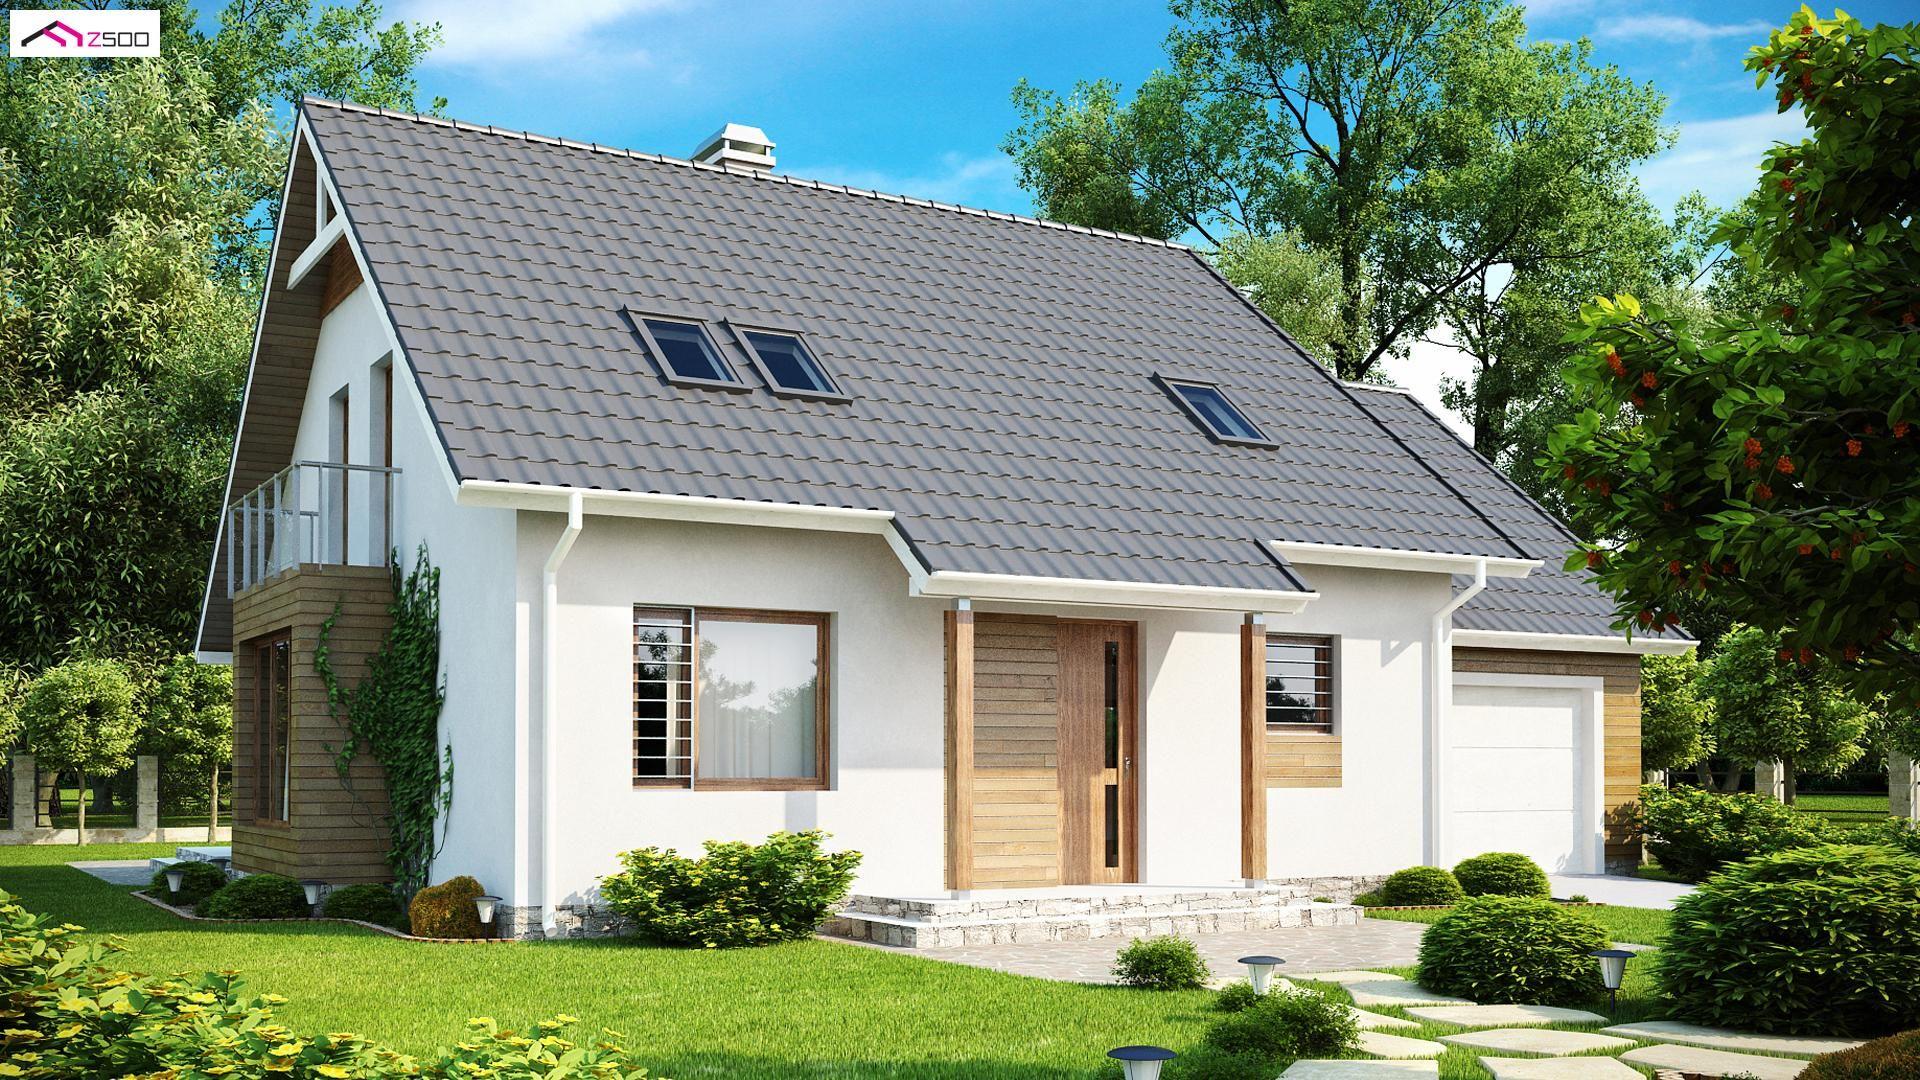 Techwood House Z500 Casas Prefabricadas Casas Pinterest House